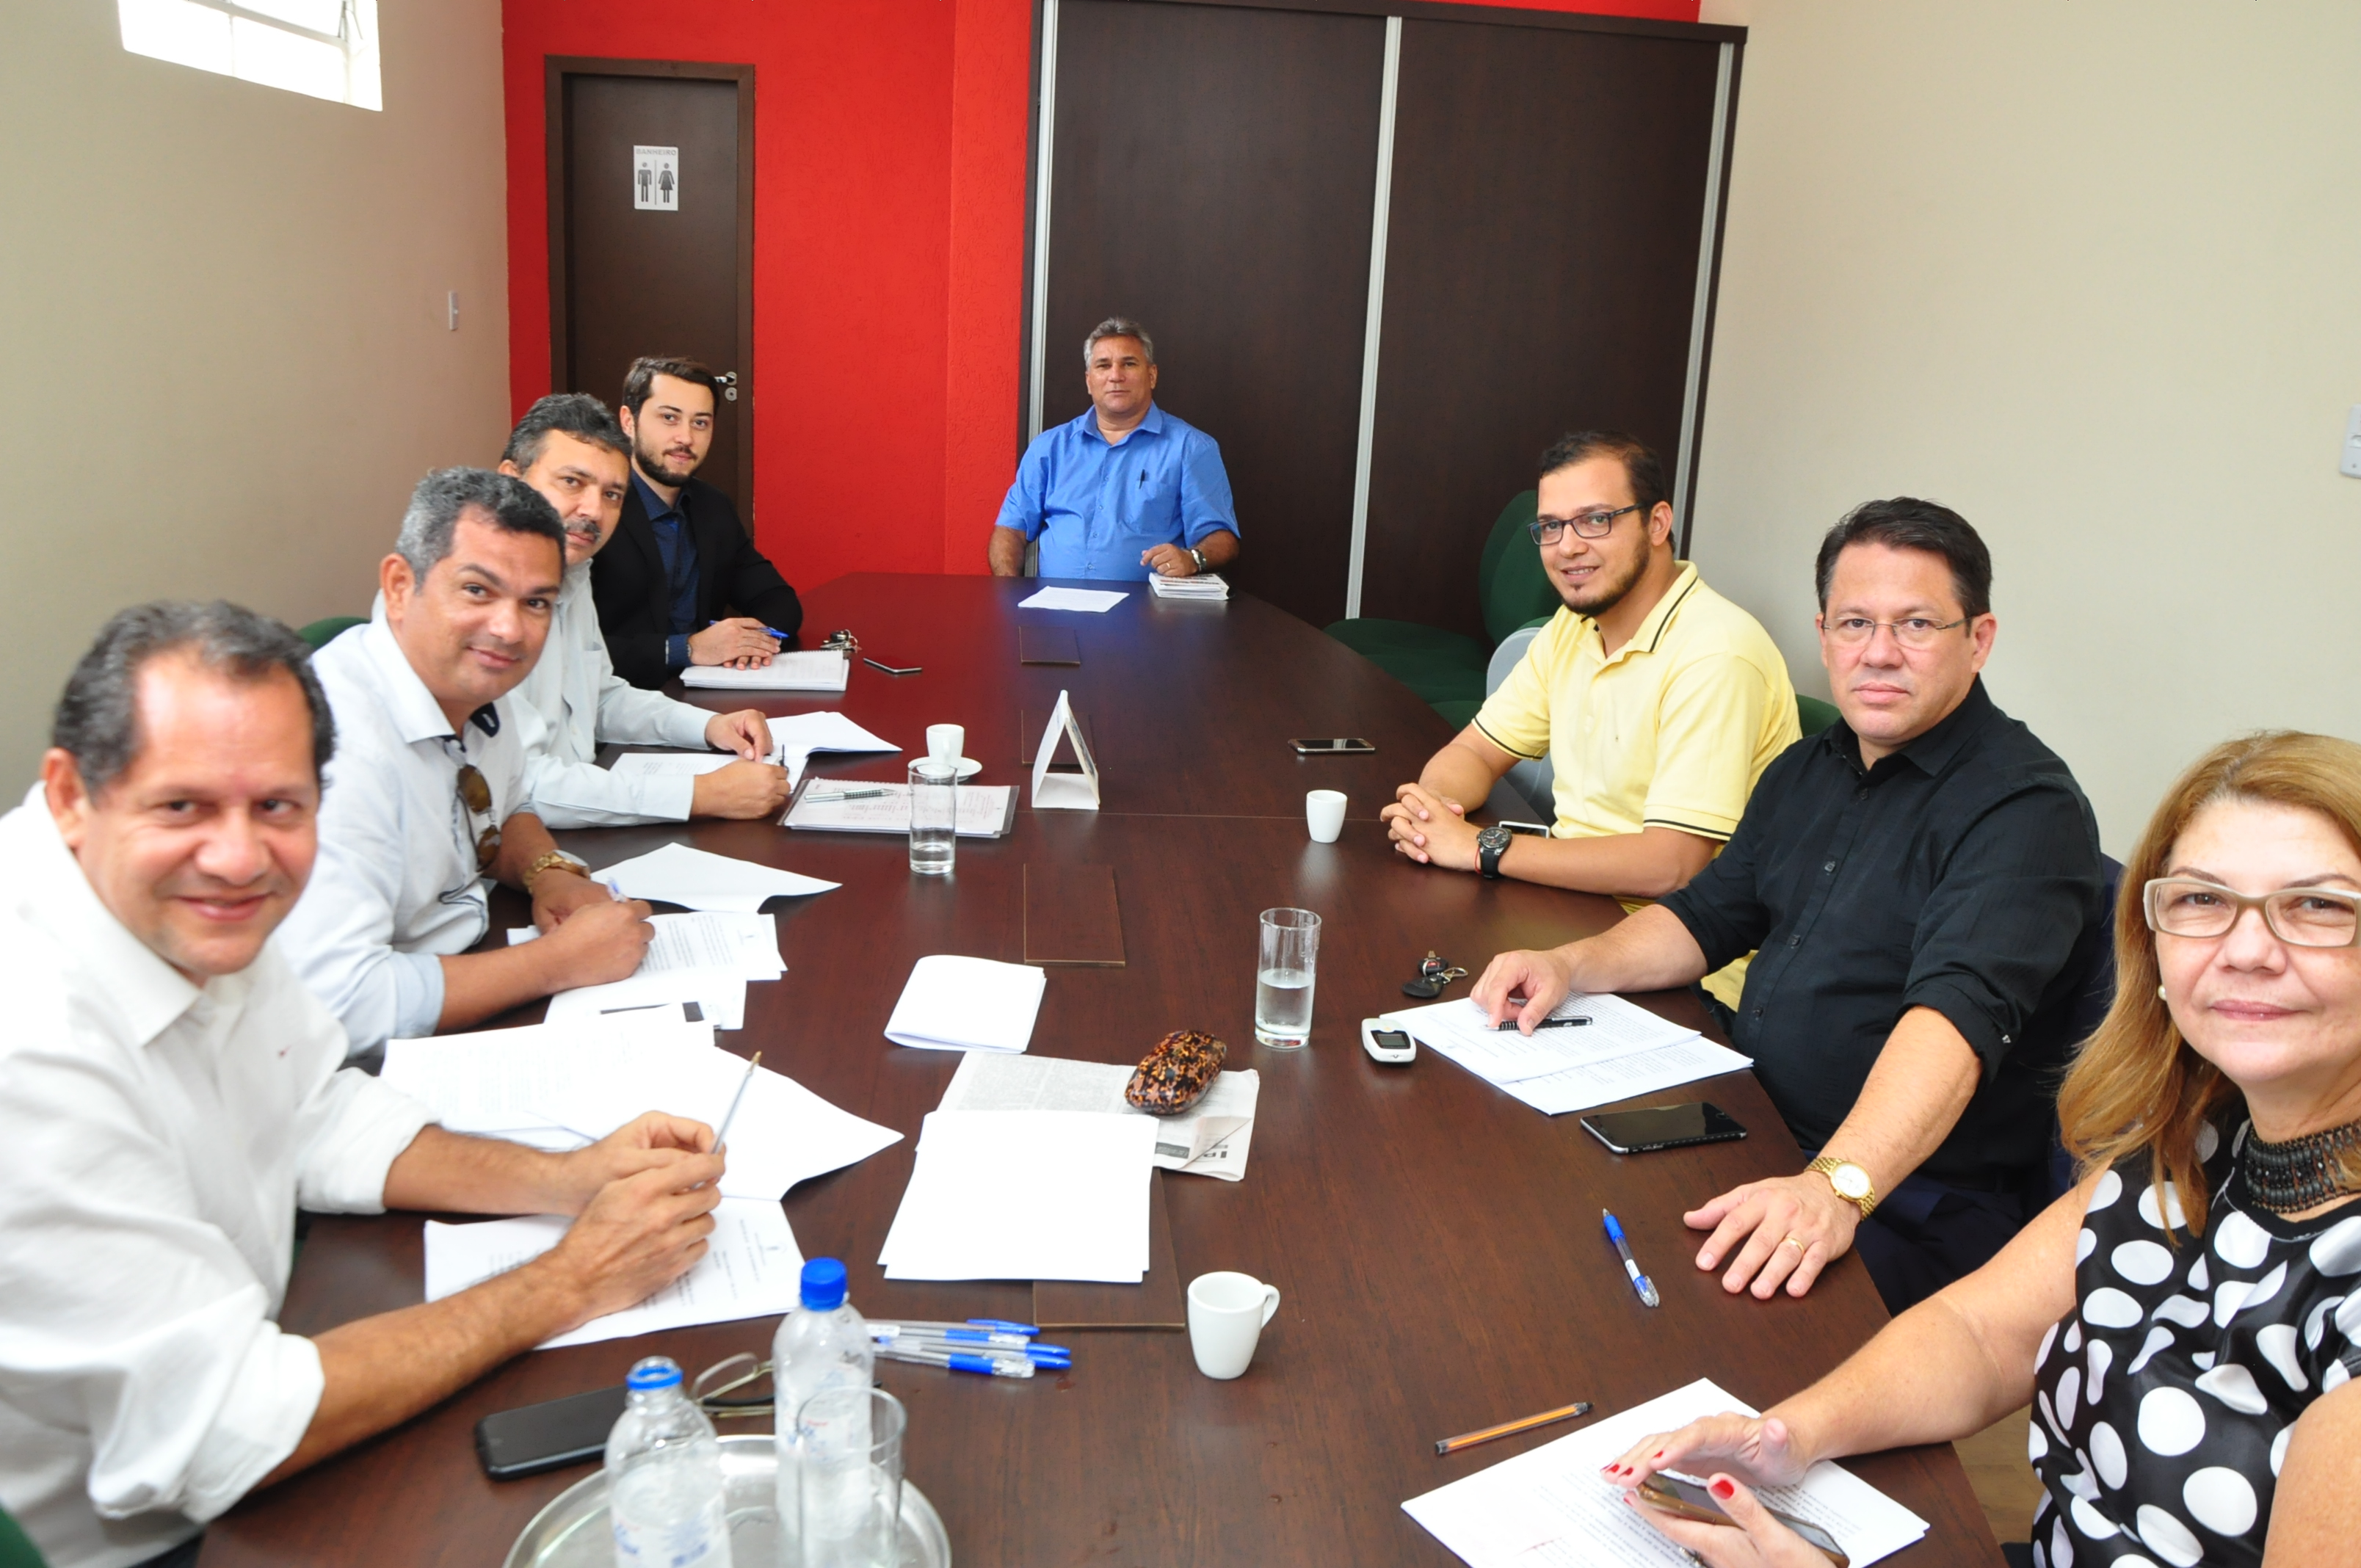 Vereadores se reúnem para debater sobre aumento tarifário